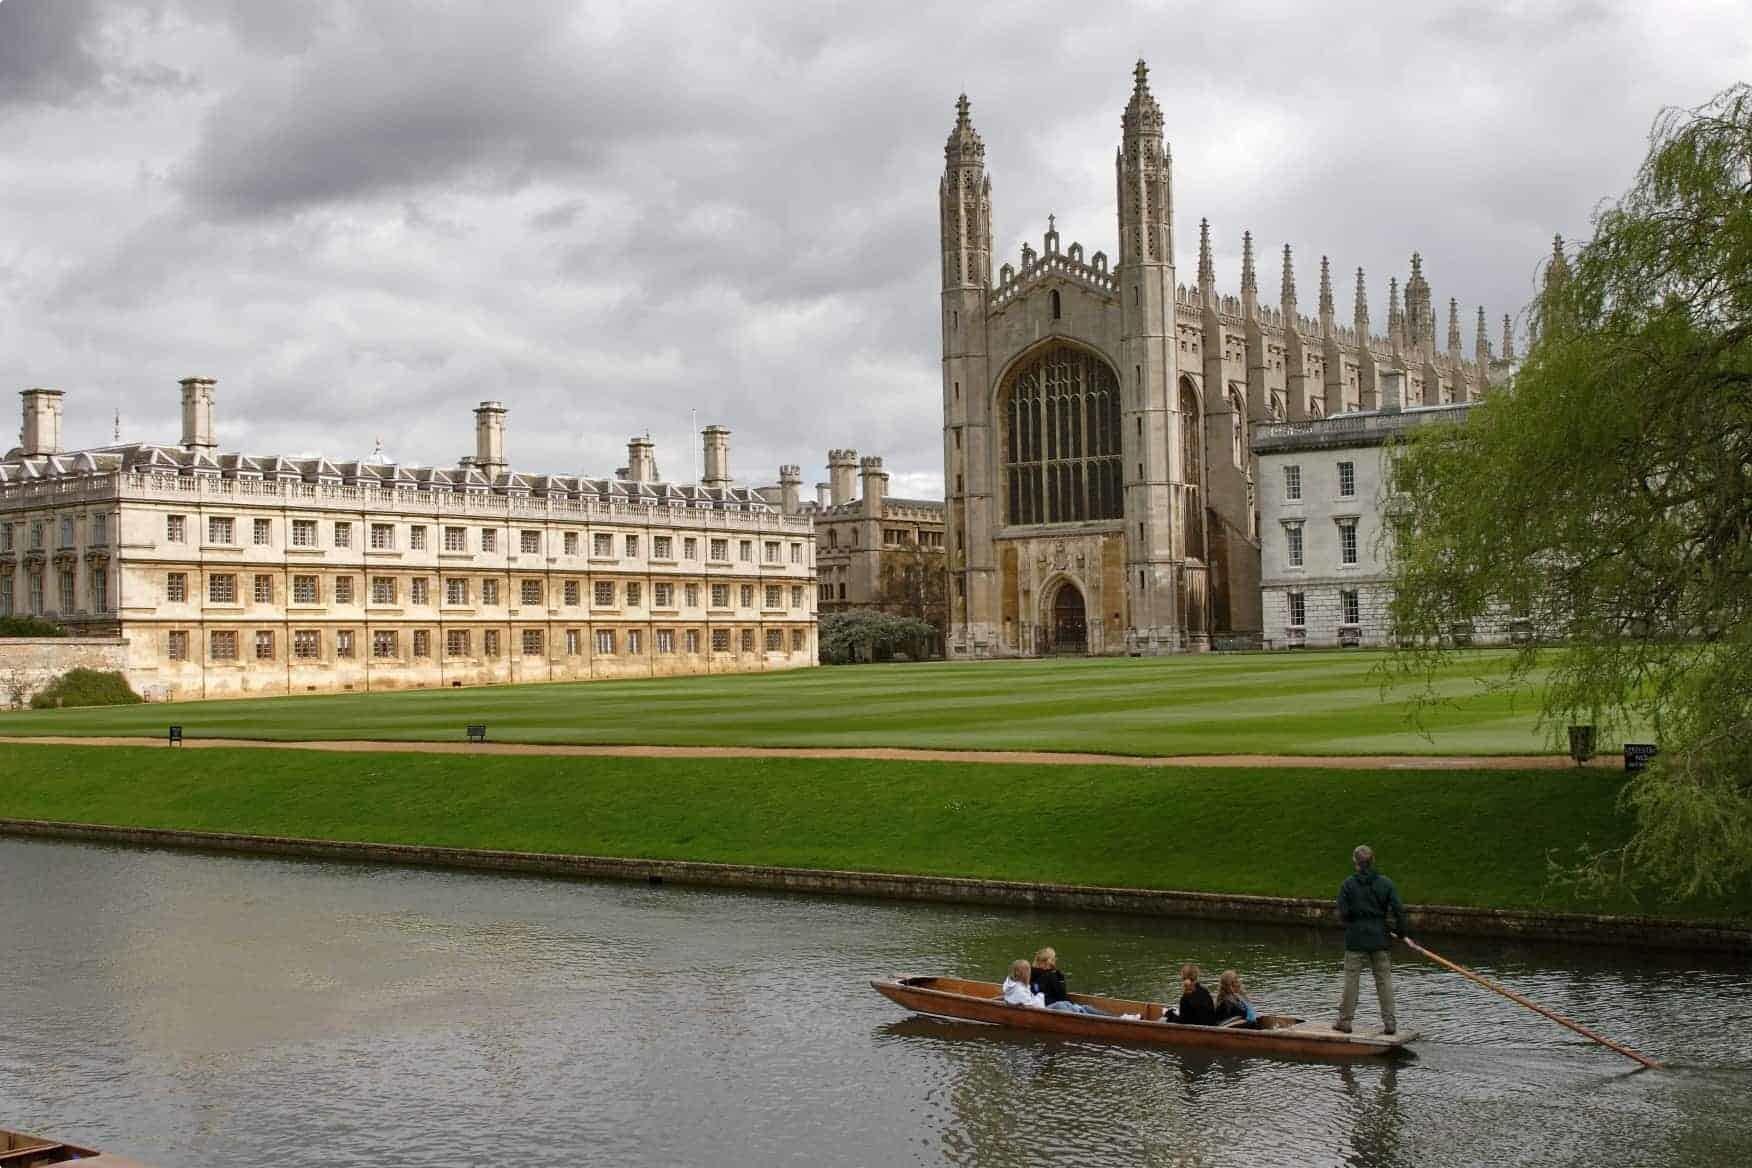 The Backs, Cambridge